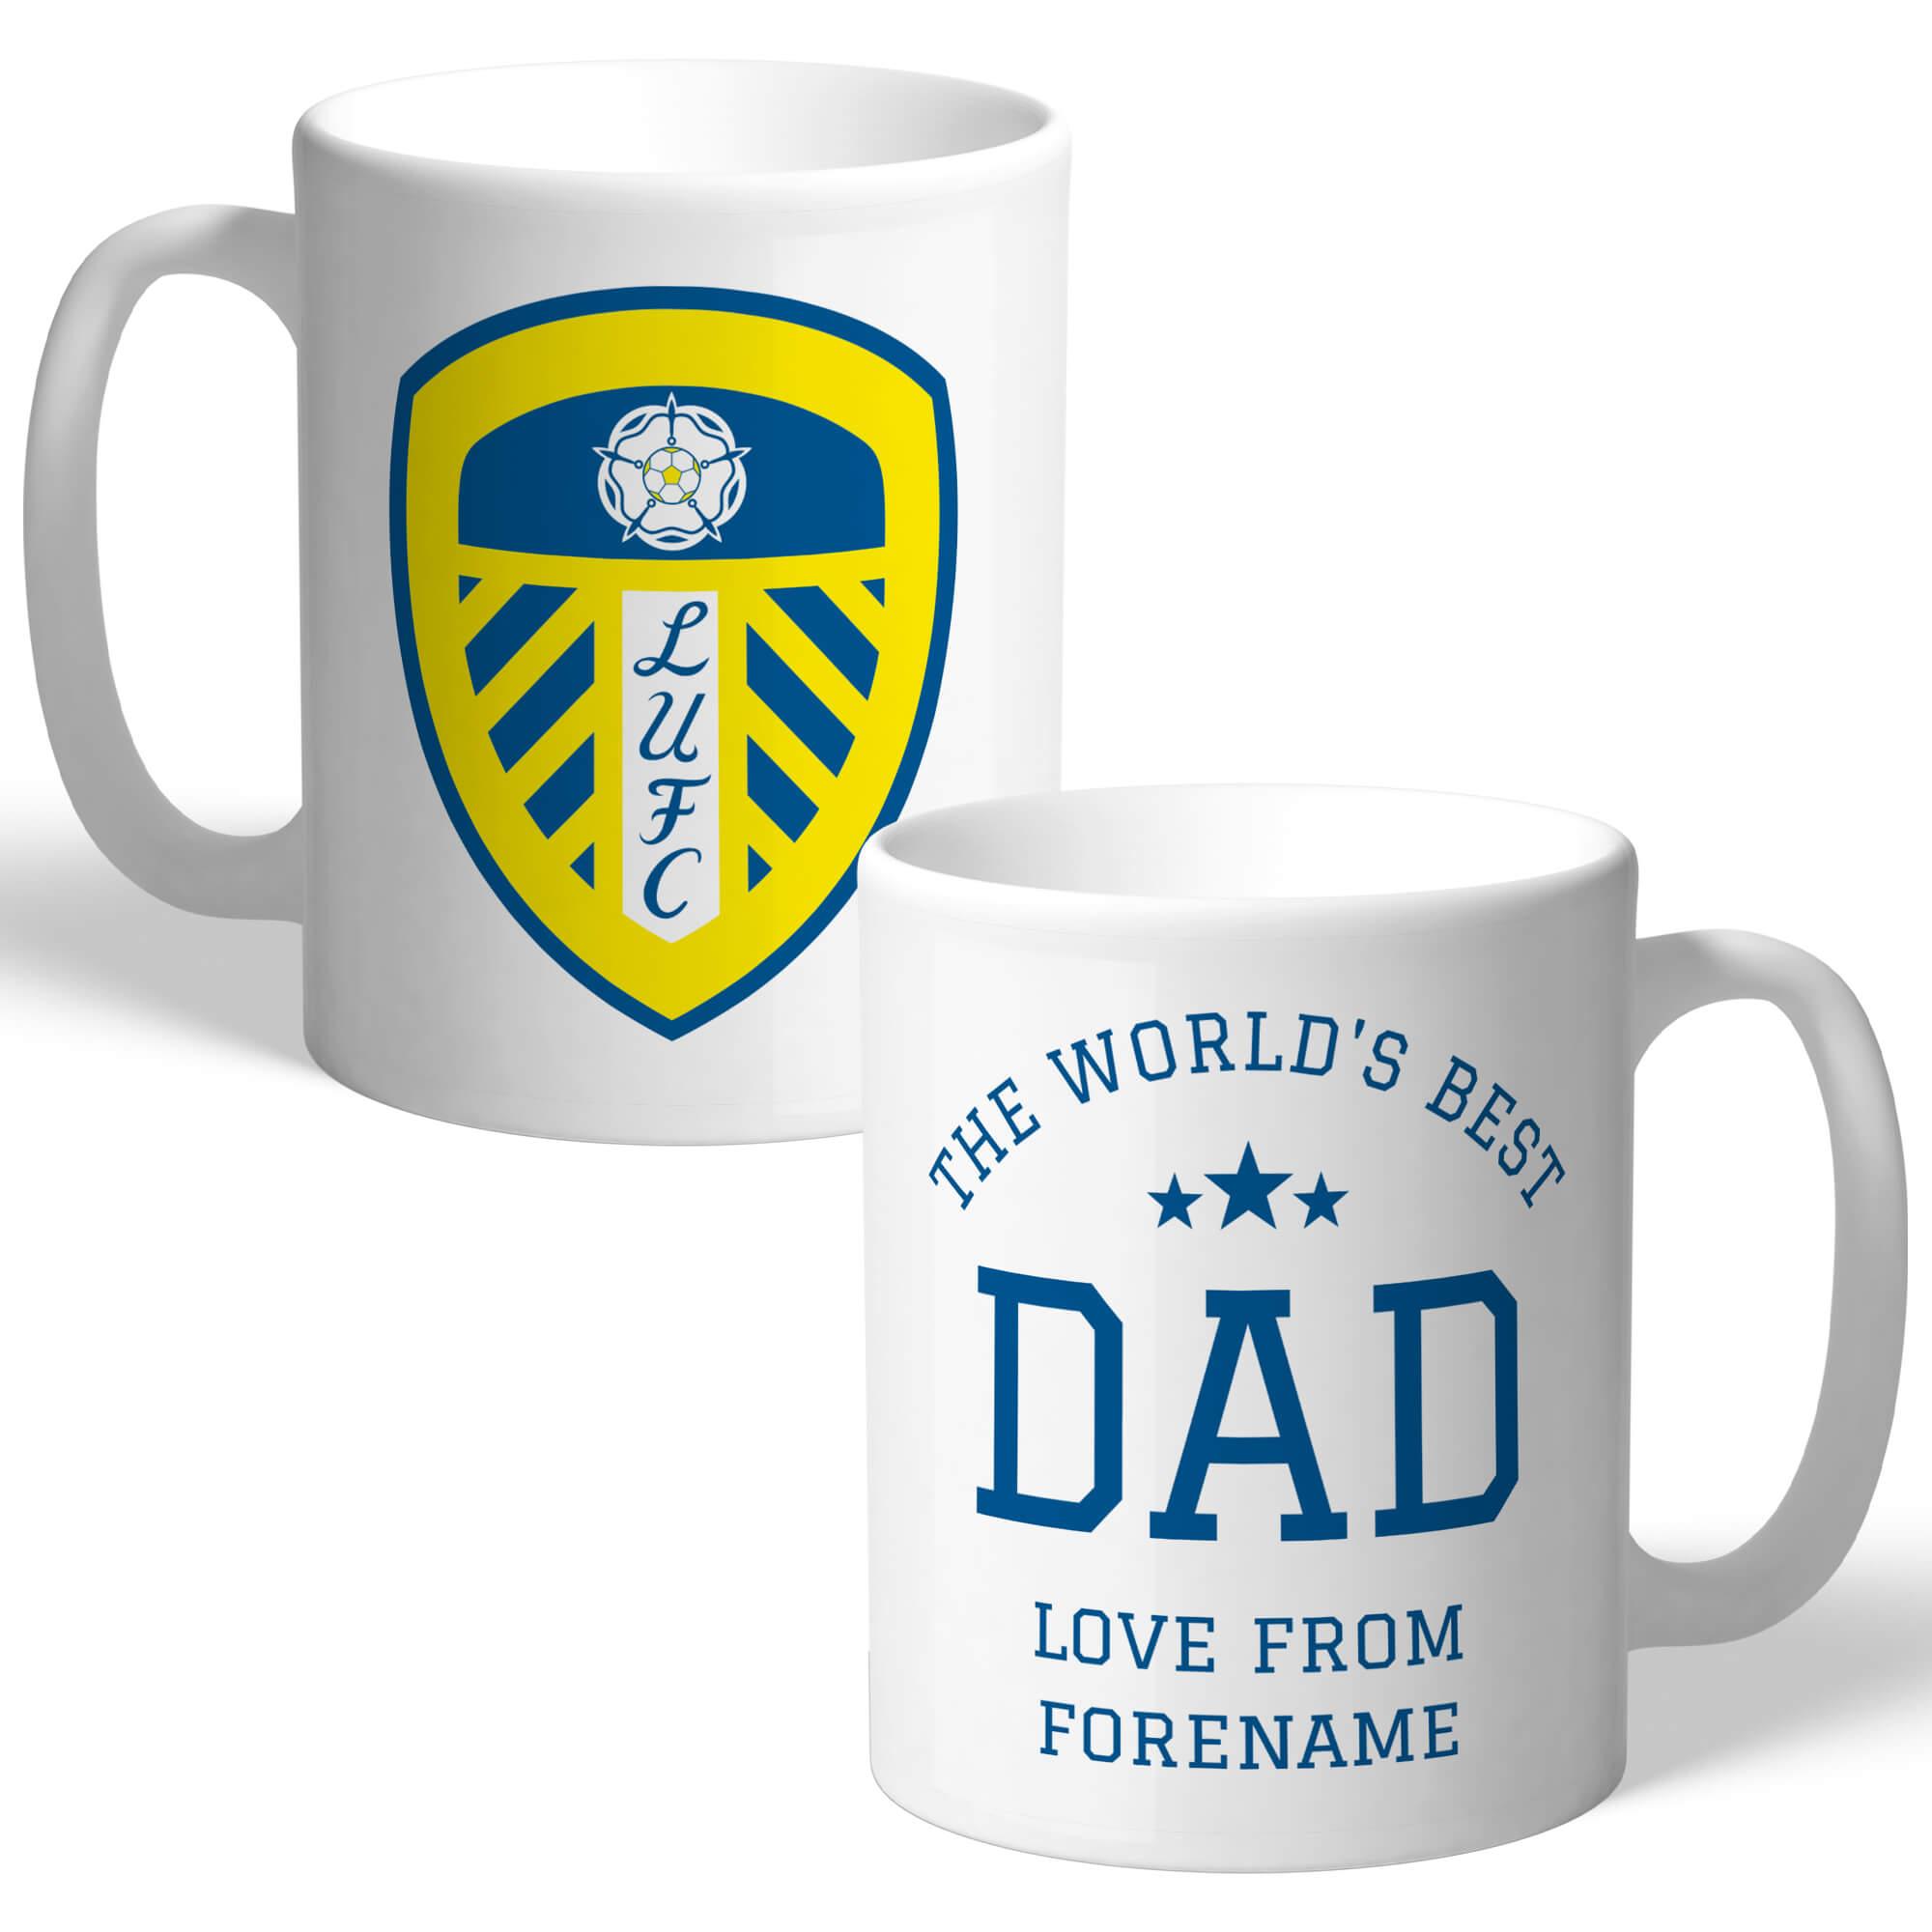 Leeds United FC World's Best Dad Mug